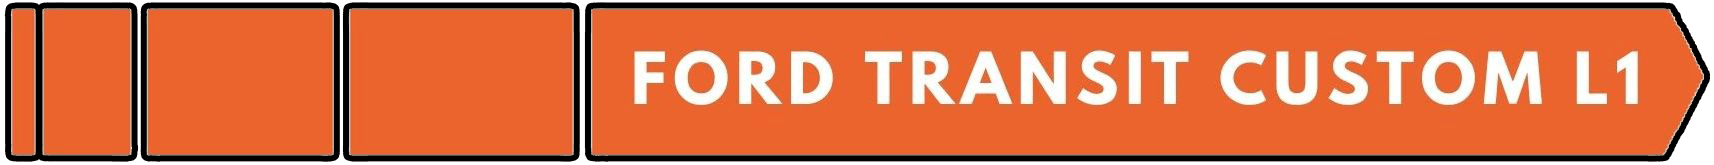 Ford-Transit-cust